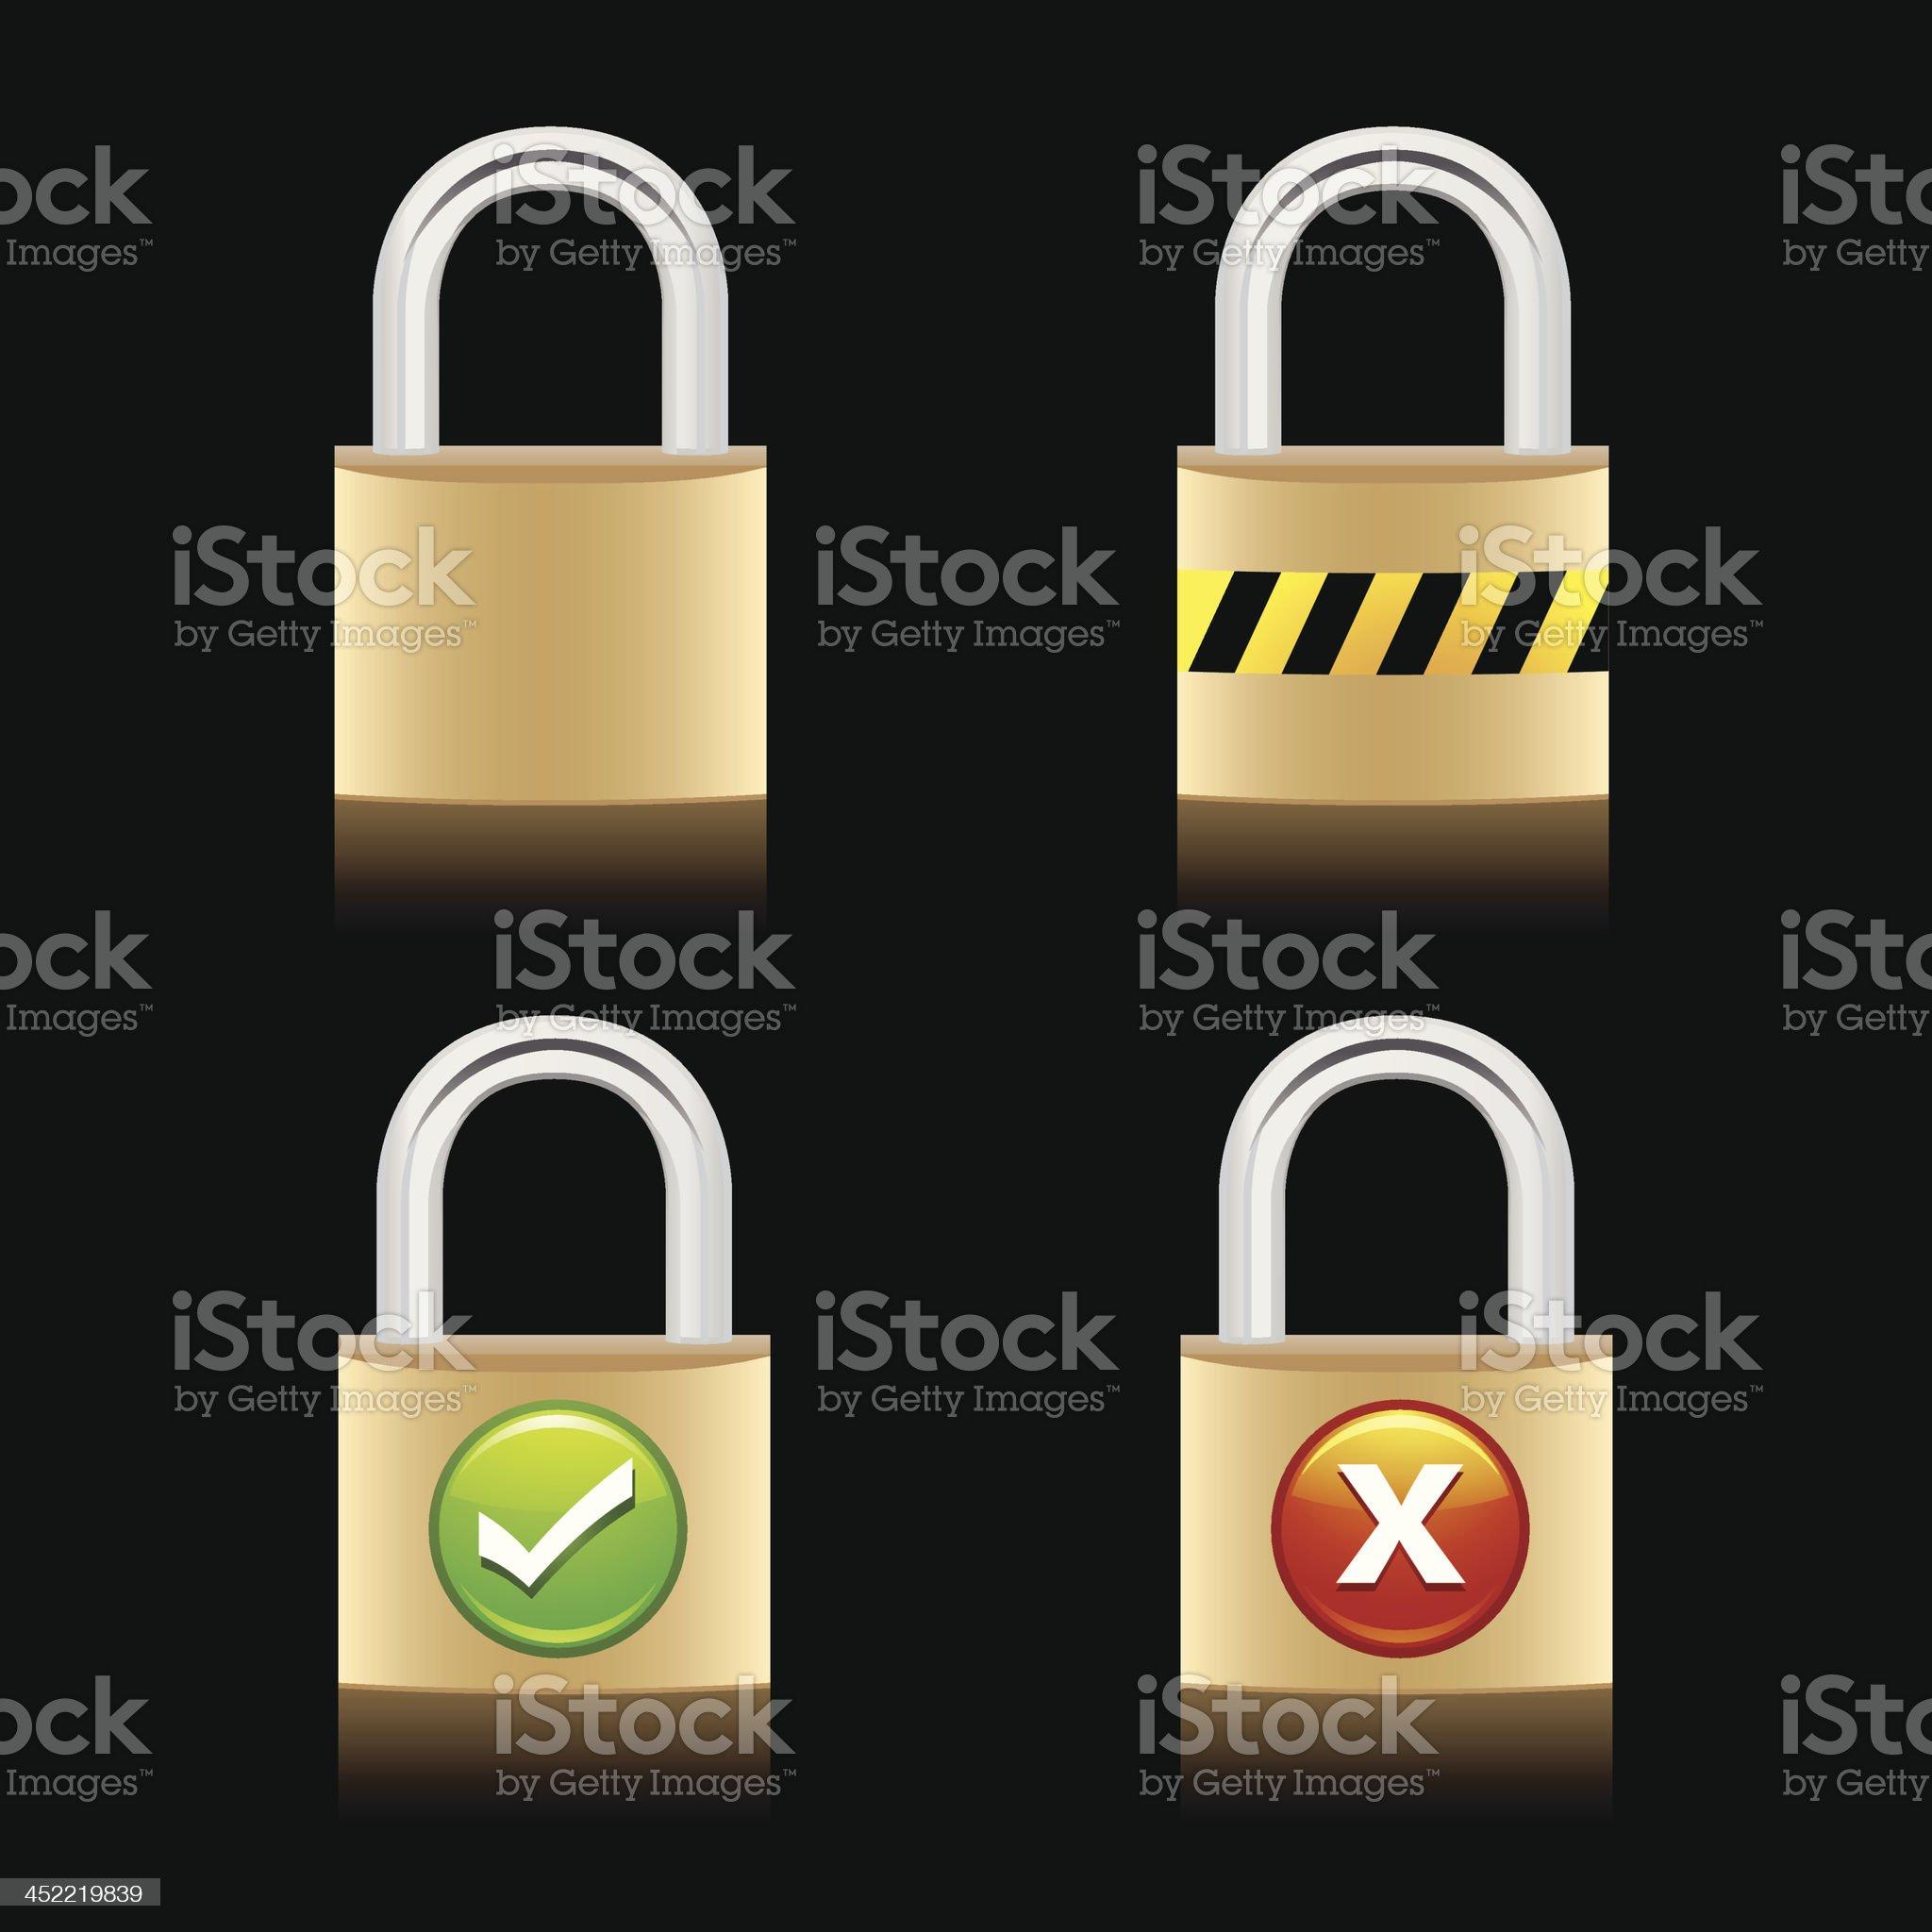 Lock icon royalty-free stock vector art